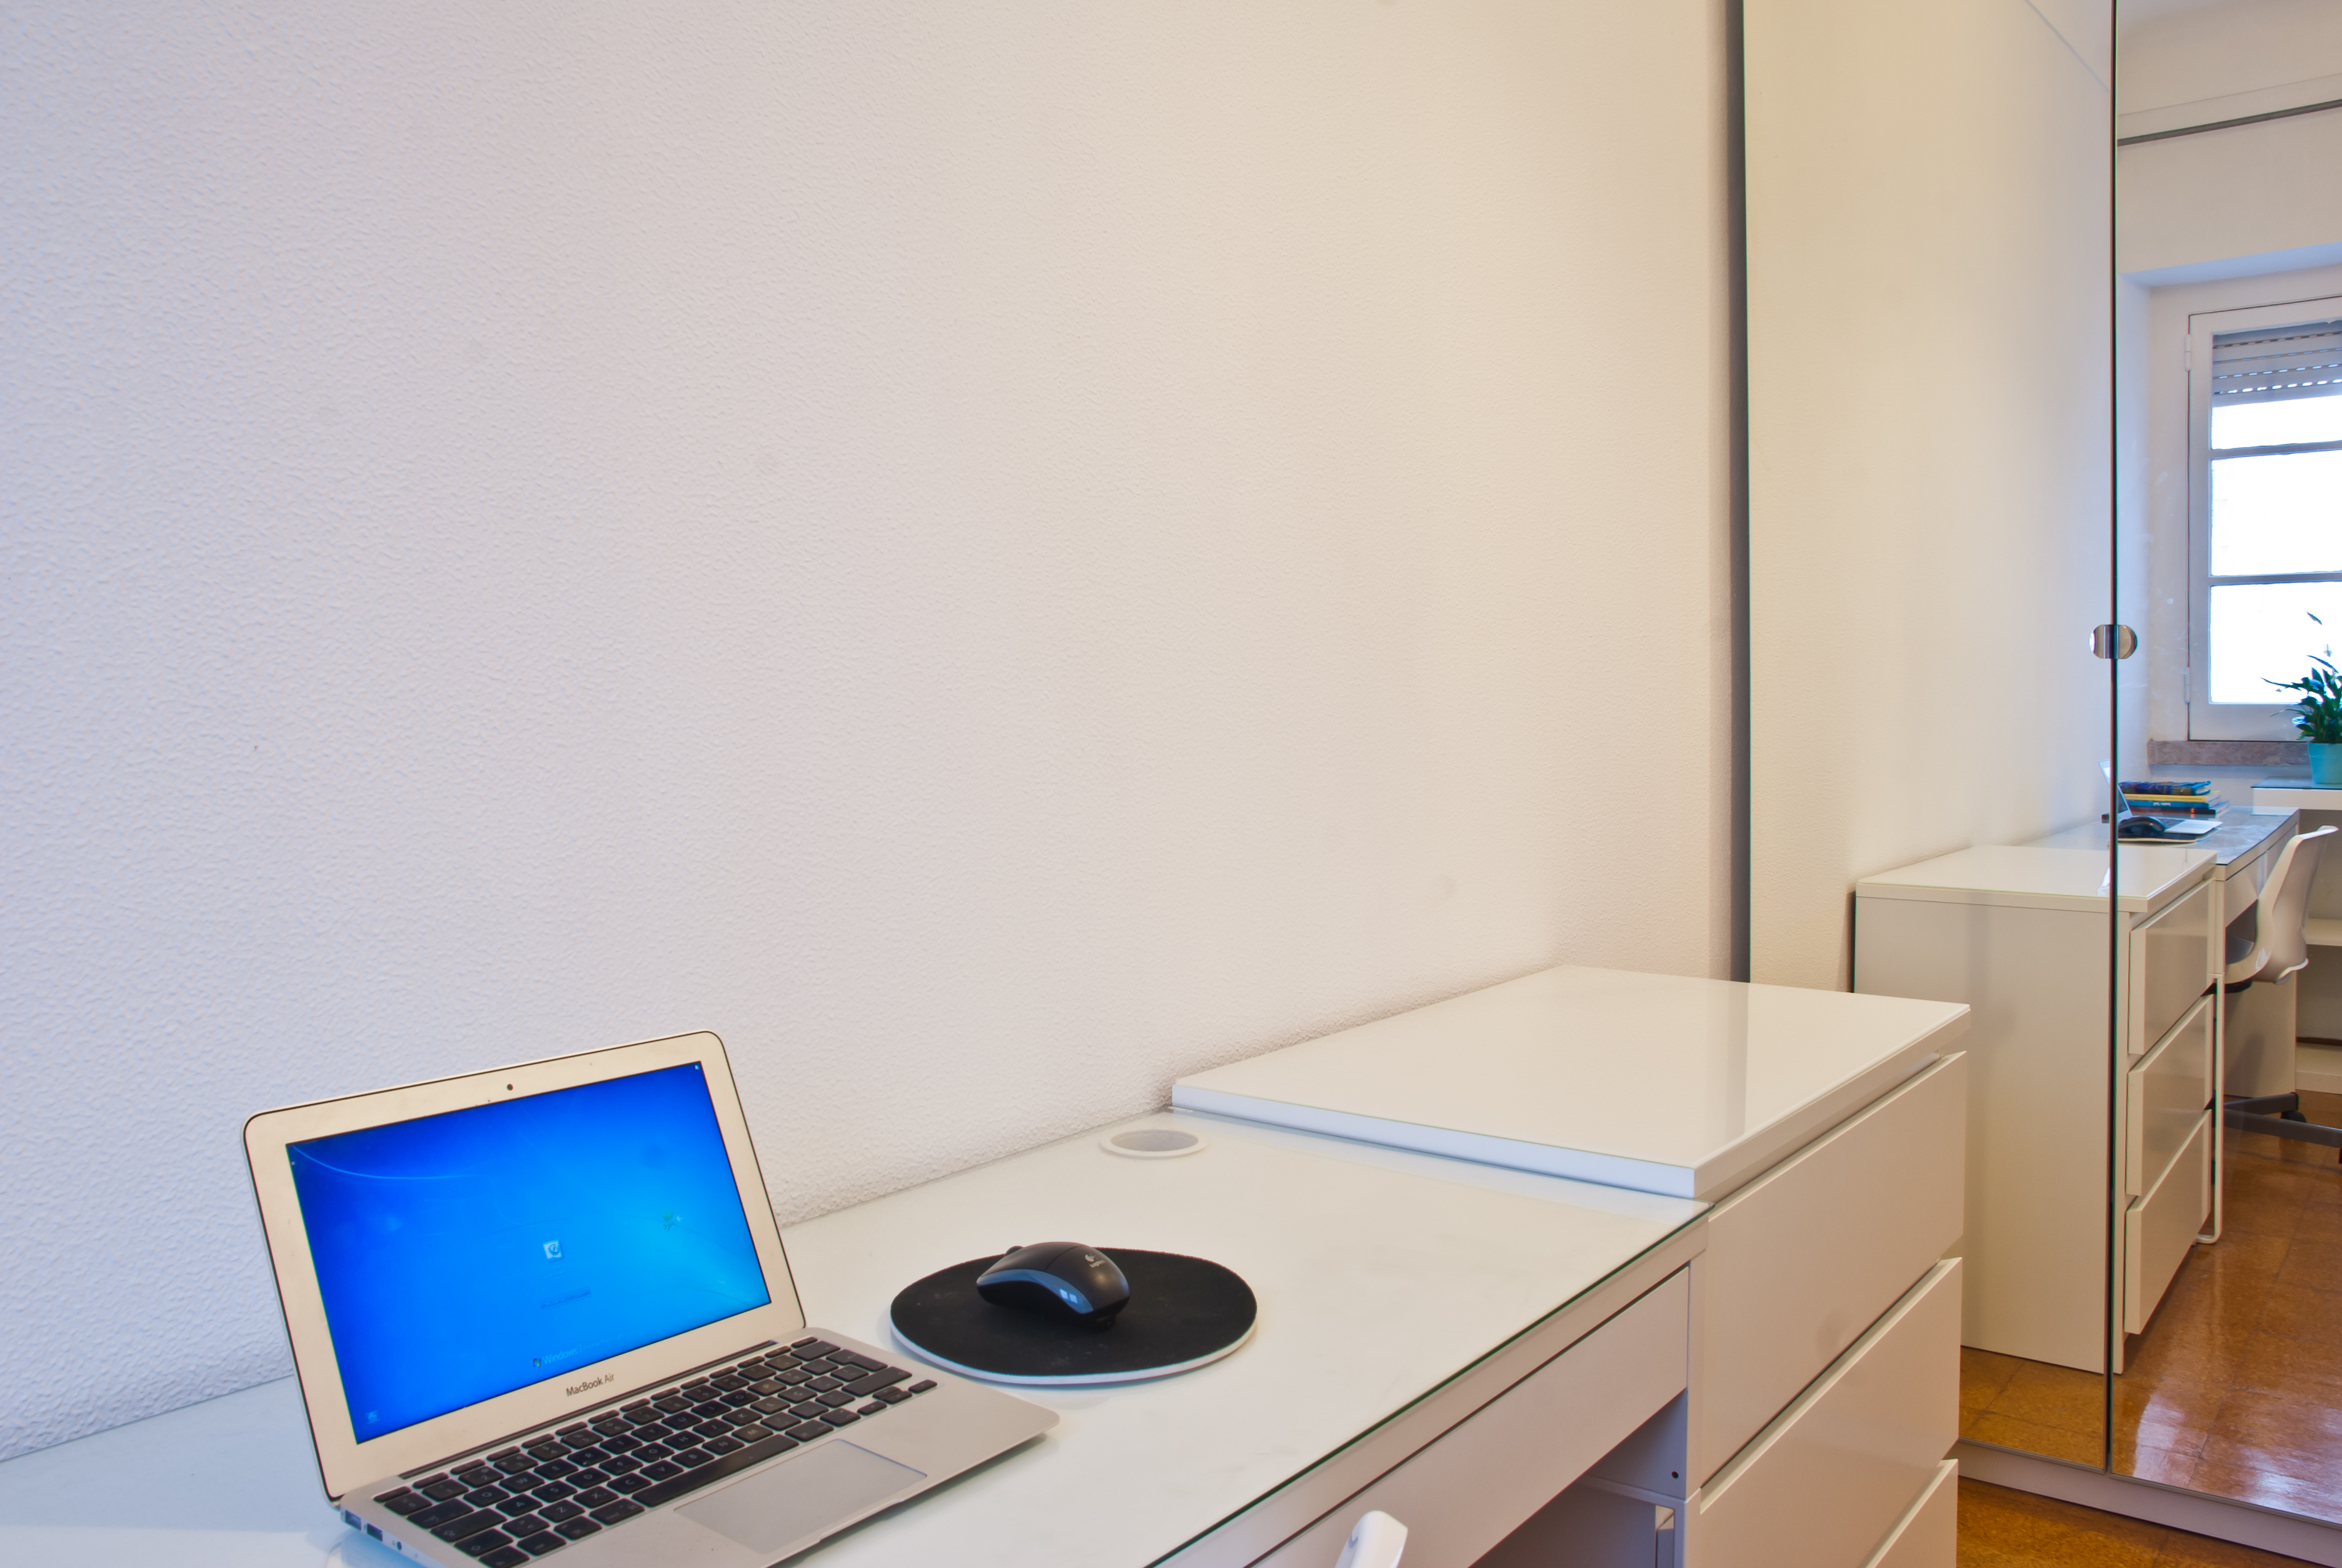 GJ_-_Quarto.Room_nº6_-_Foto_2.jpg